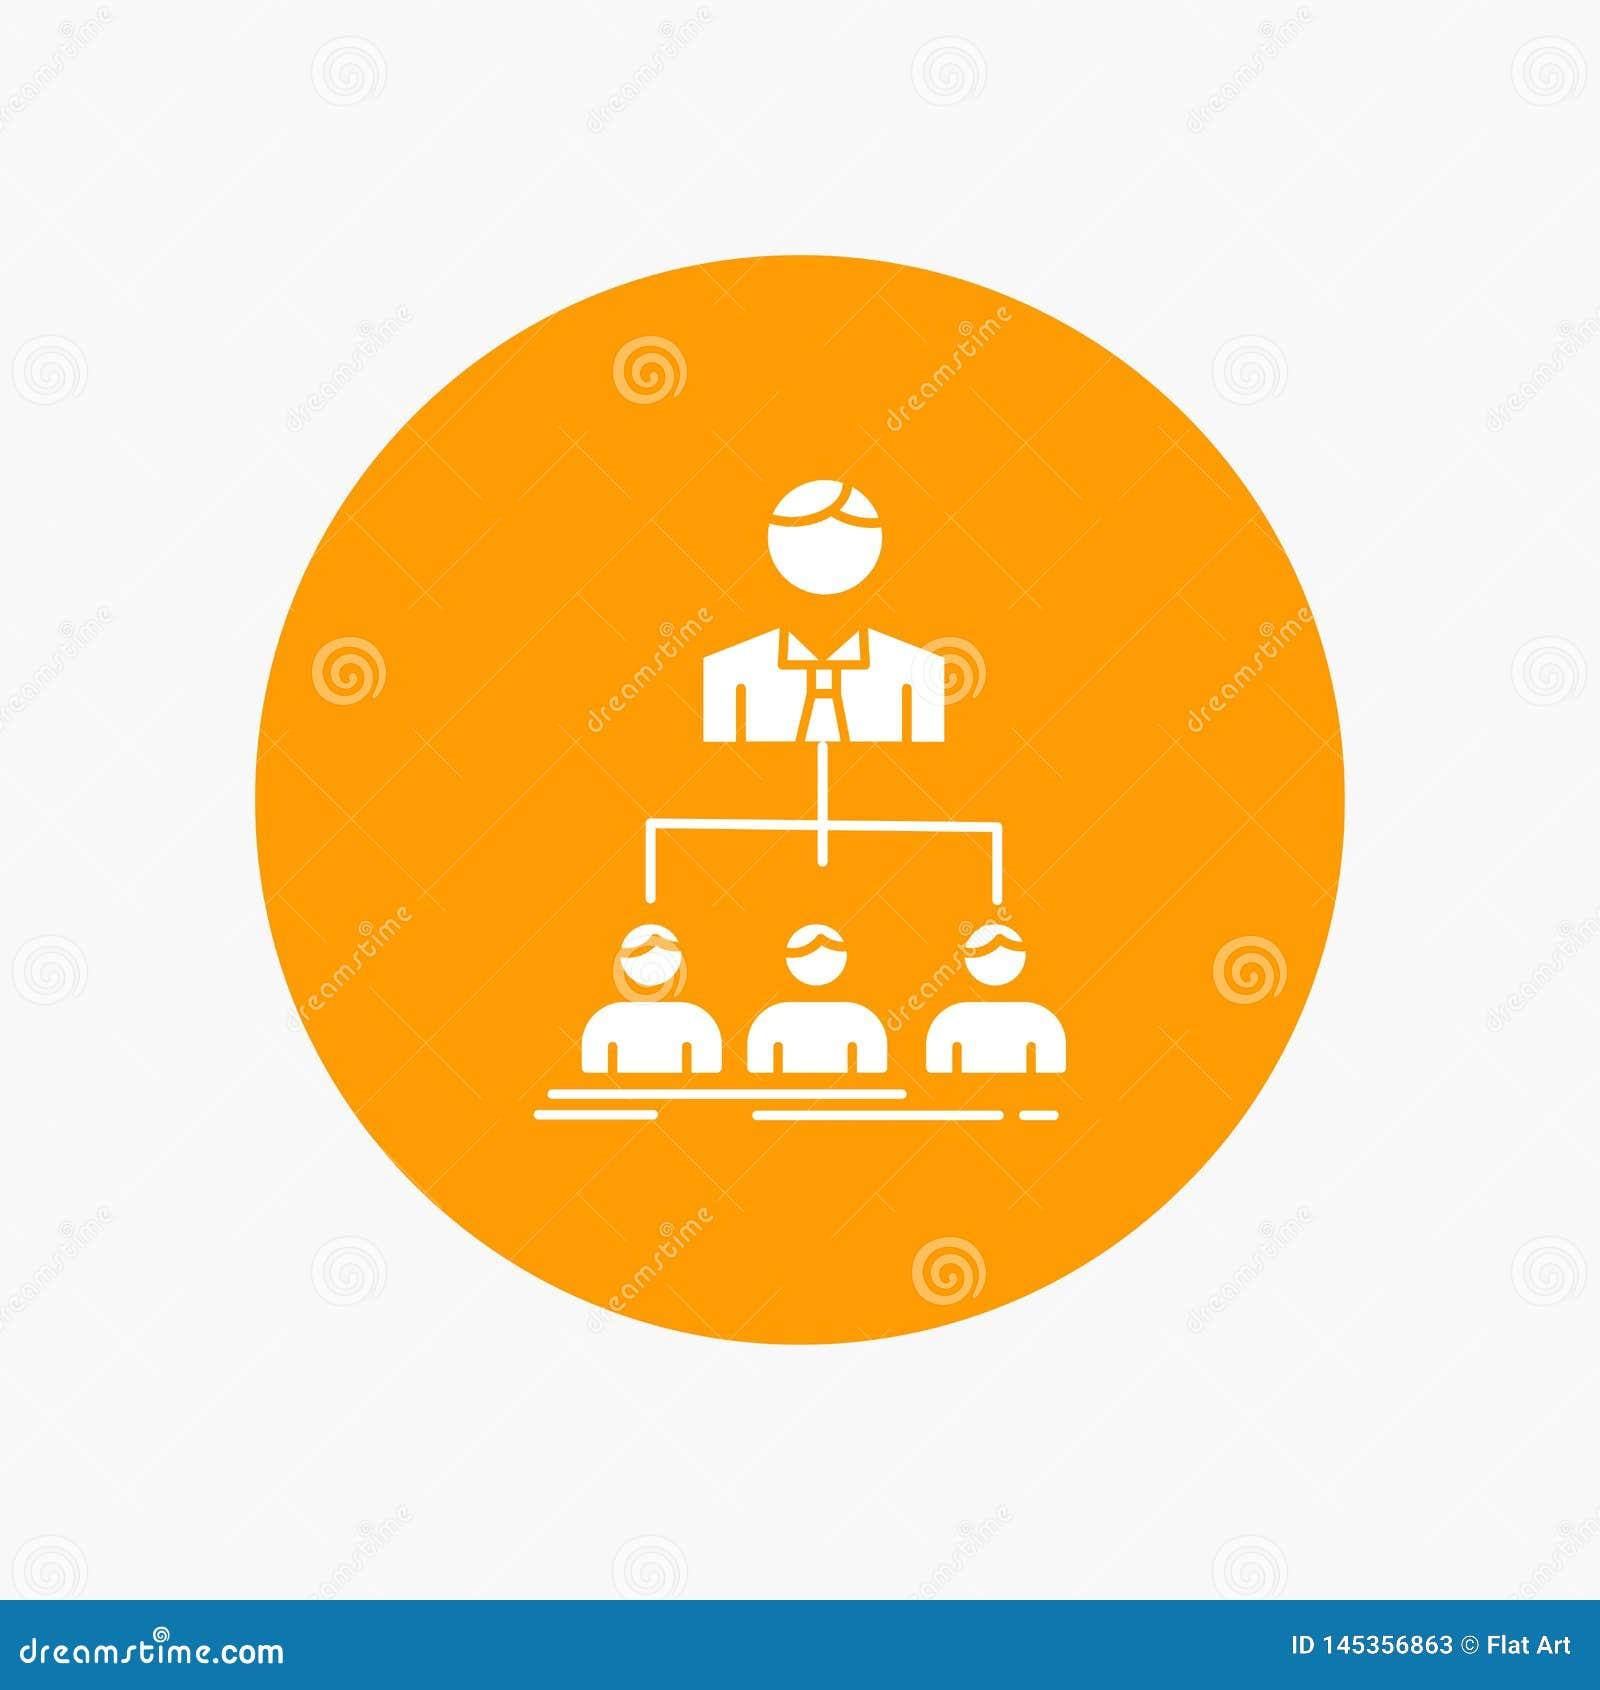 Team, Teamwork, Organisation, Gruppe, Firmaweiße Glyph-Ikone im Kreis Vektor-Knopfillustration